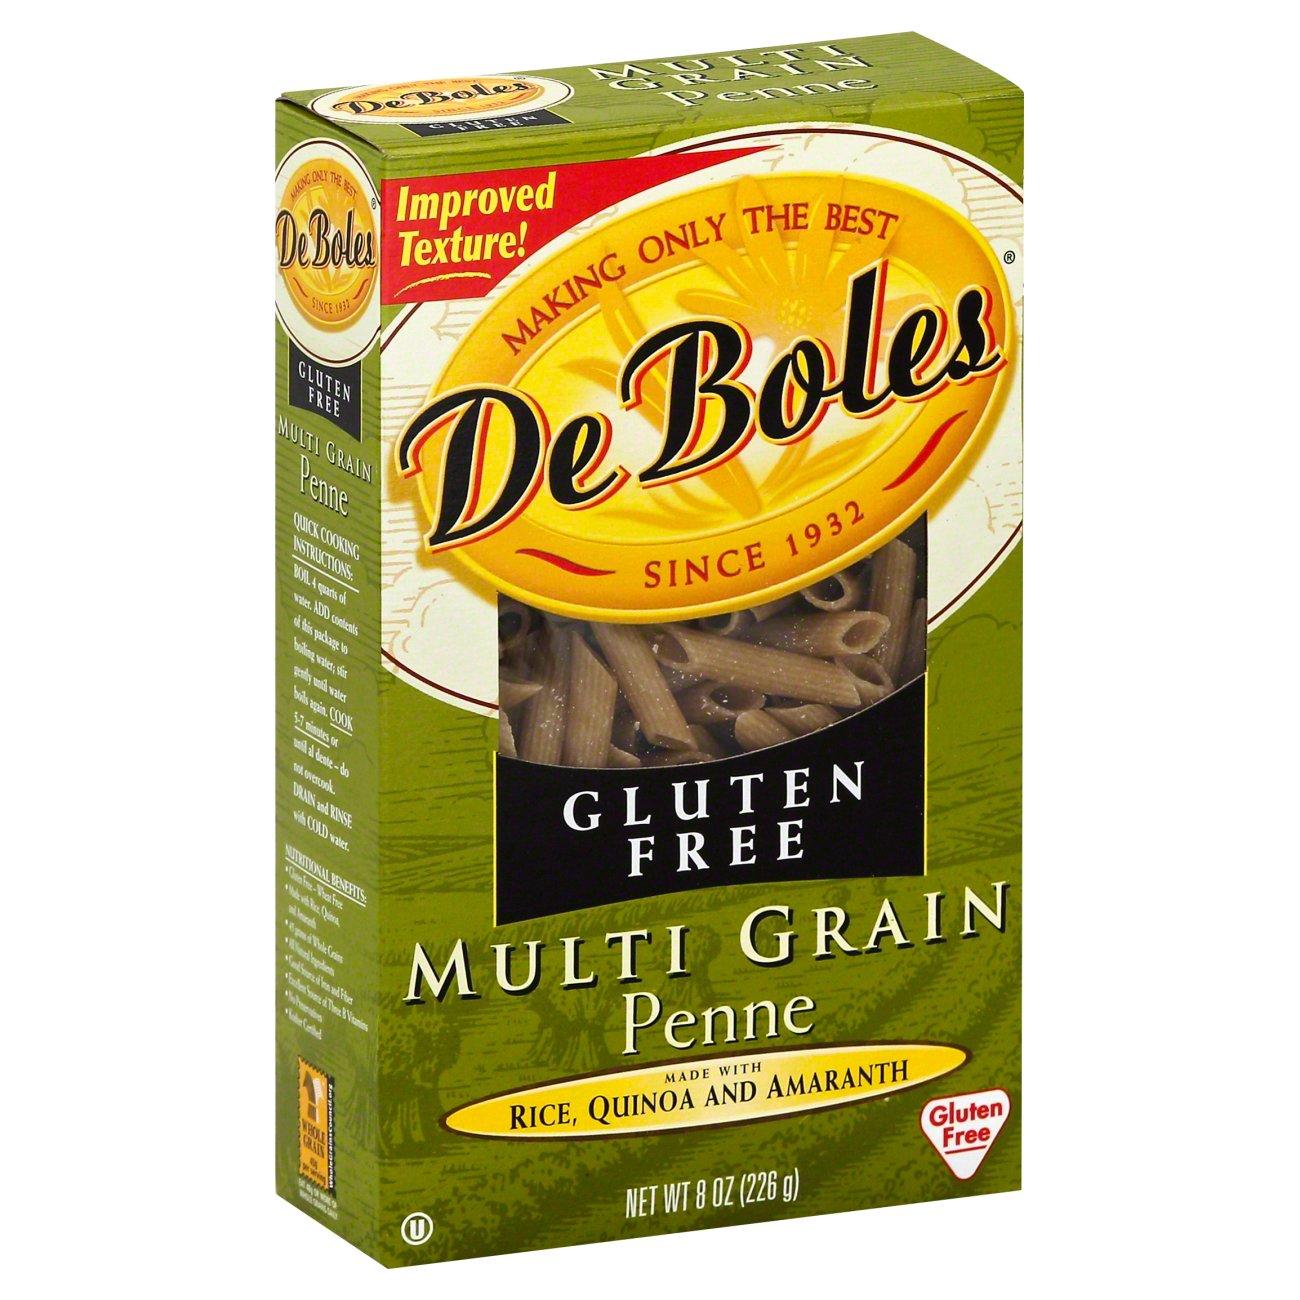 DeBoles Gluten Free Multigrain Penne - Shop Pasta at H-E-B